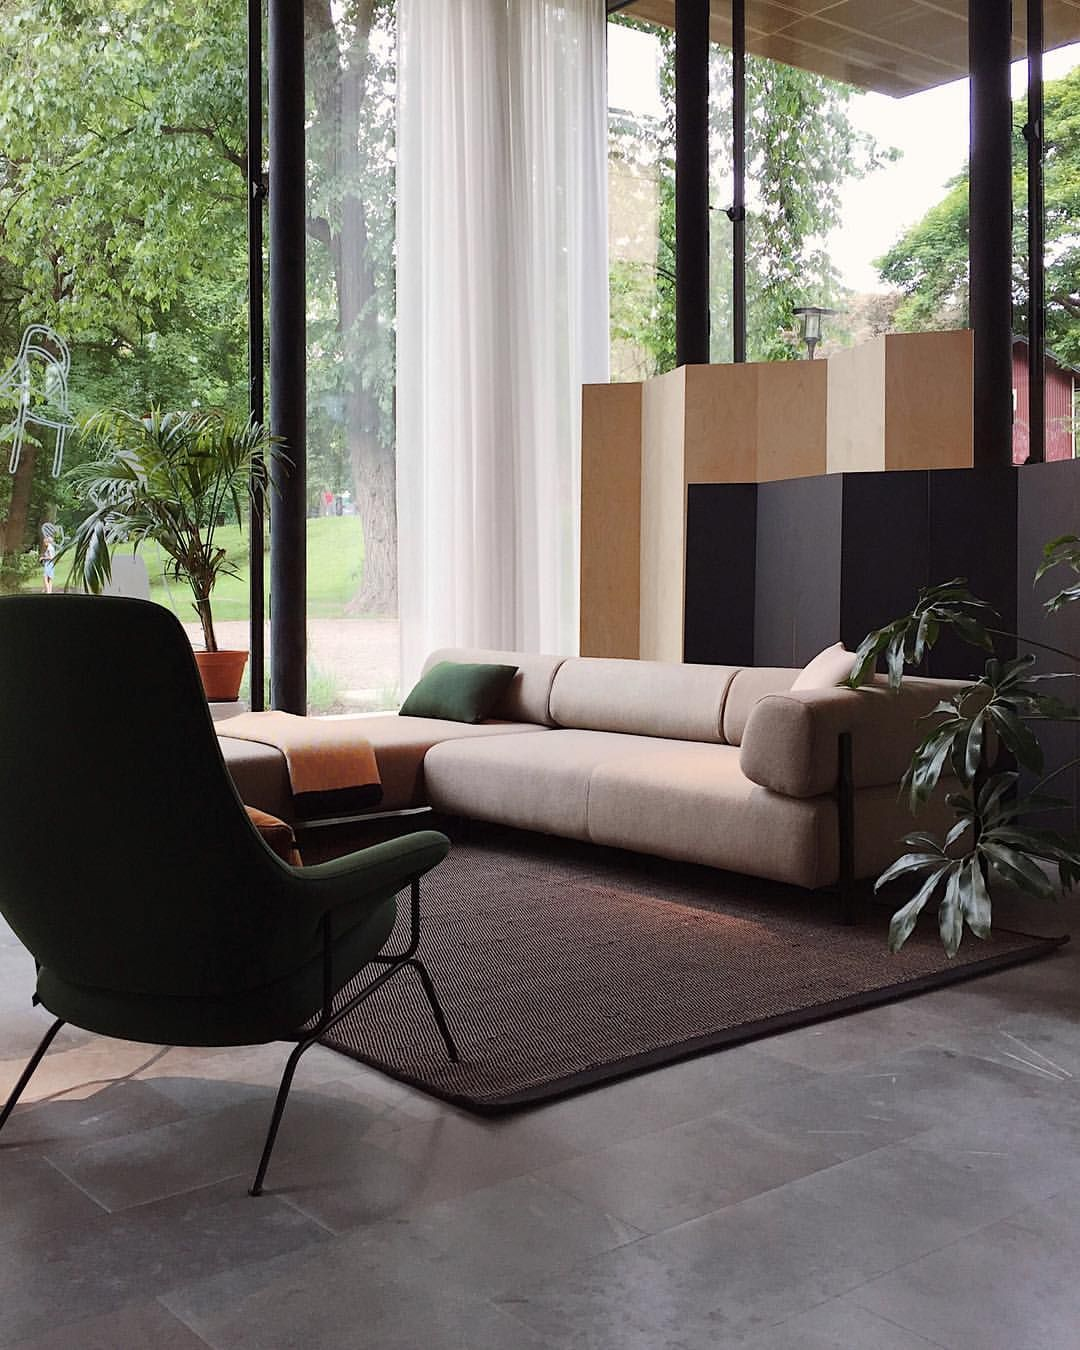 latest sofa designs for living room%0A    gillamarkeringar    kommentarer  Hem   hem  p   Instagram  Interior  Design TipsHome Living